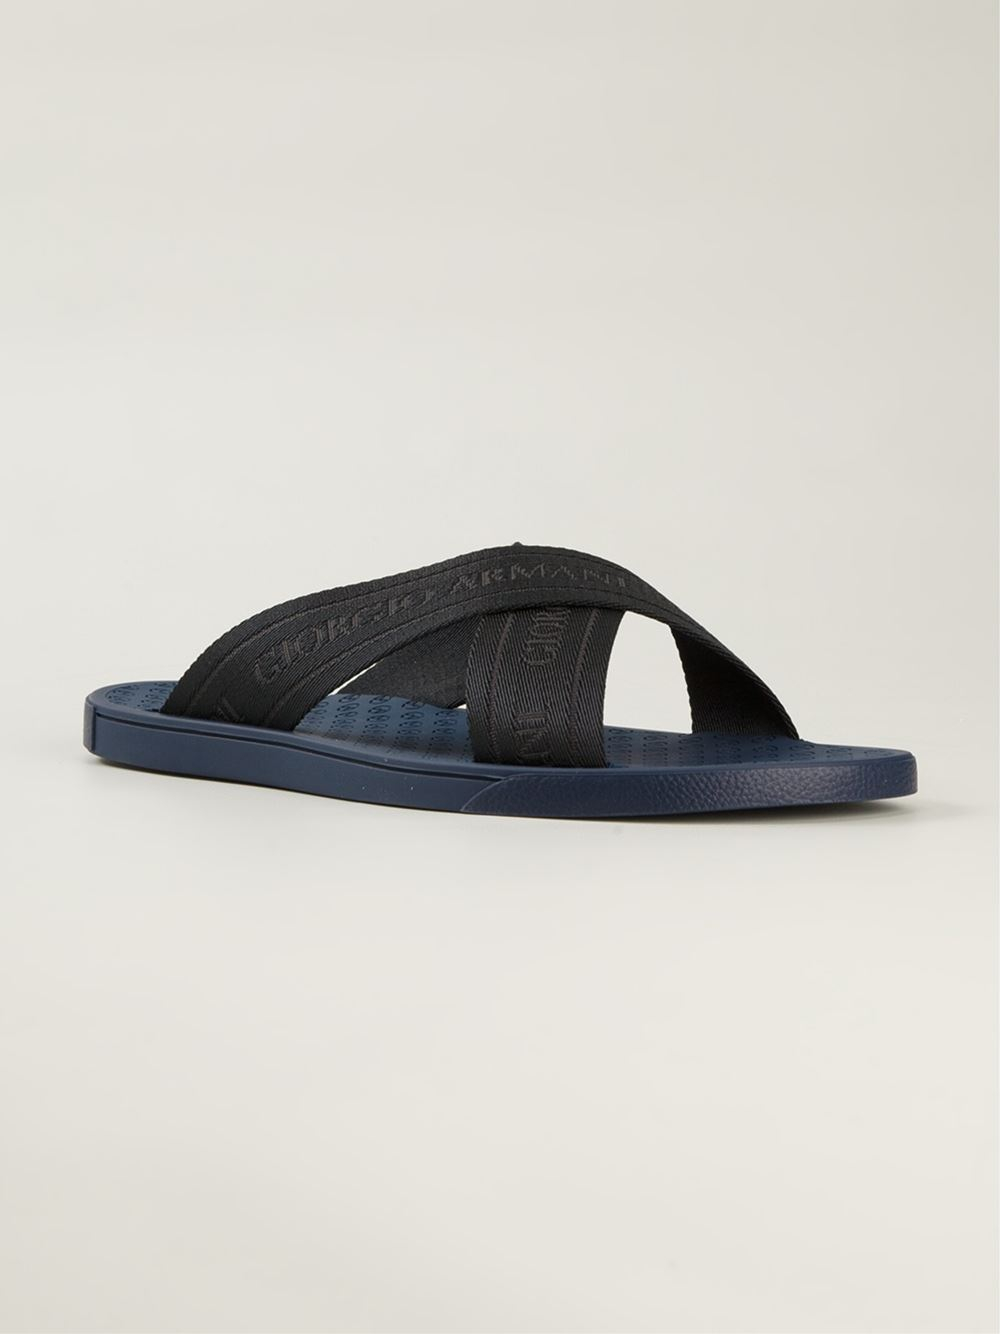 6265a9668 Lyst - Giorgio Armani Logo Crossed Sandals in Black for Men